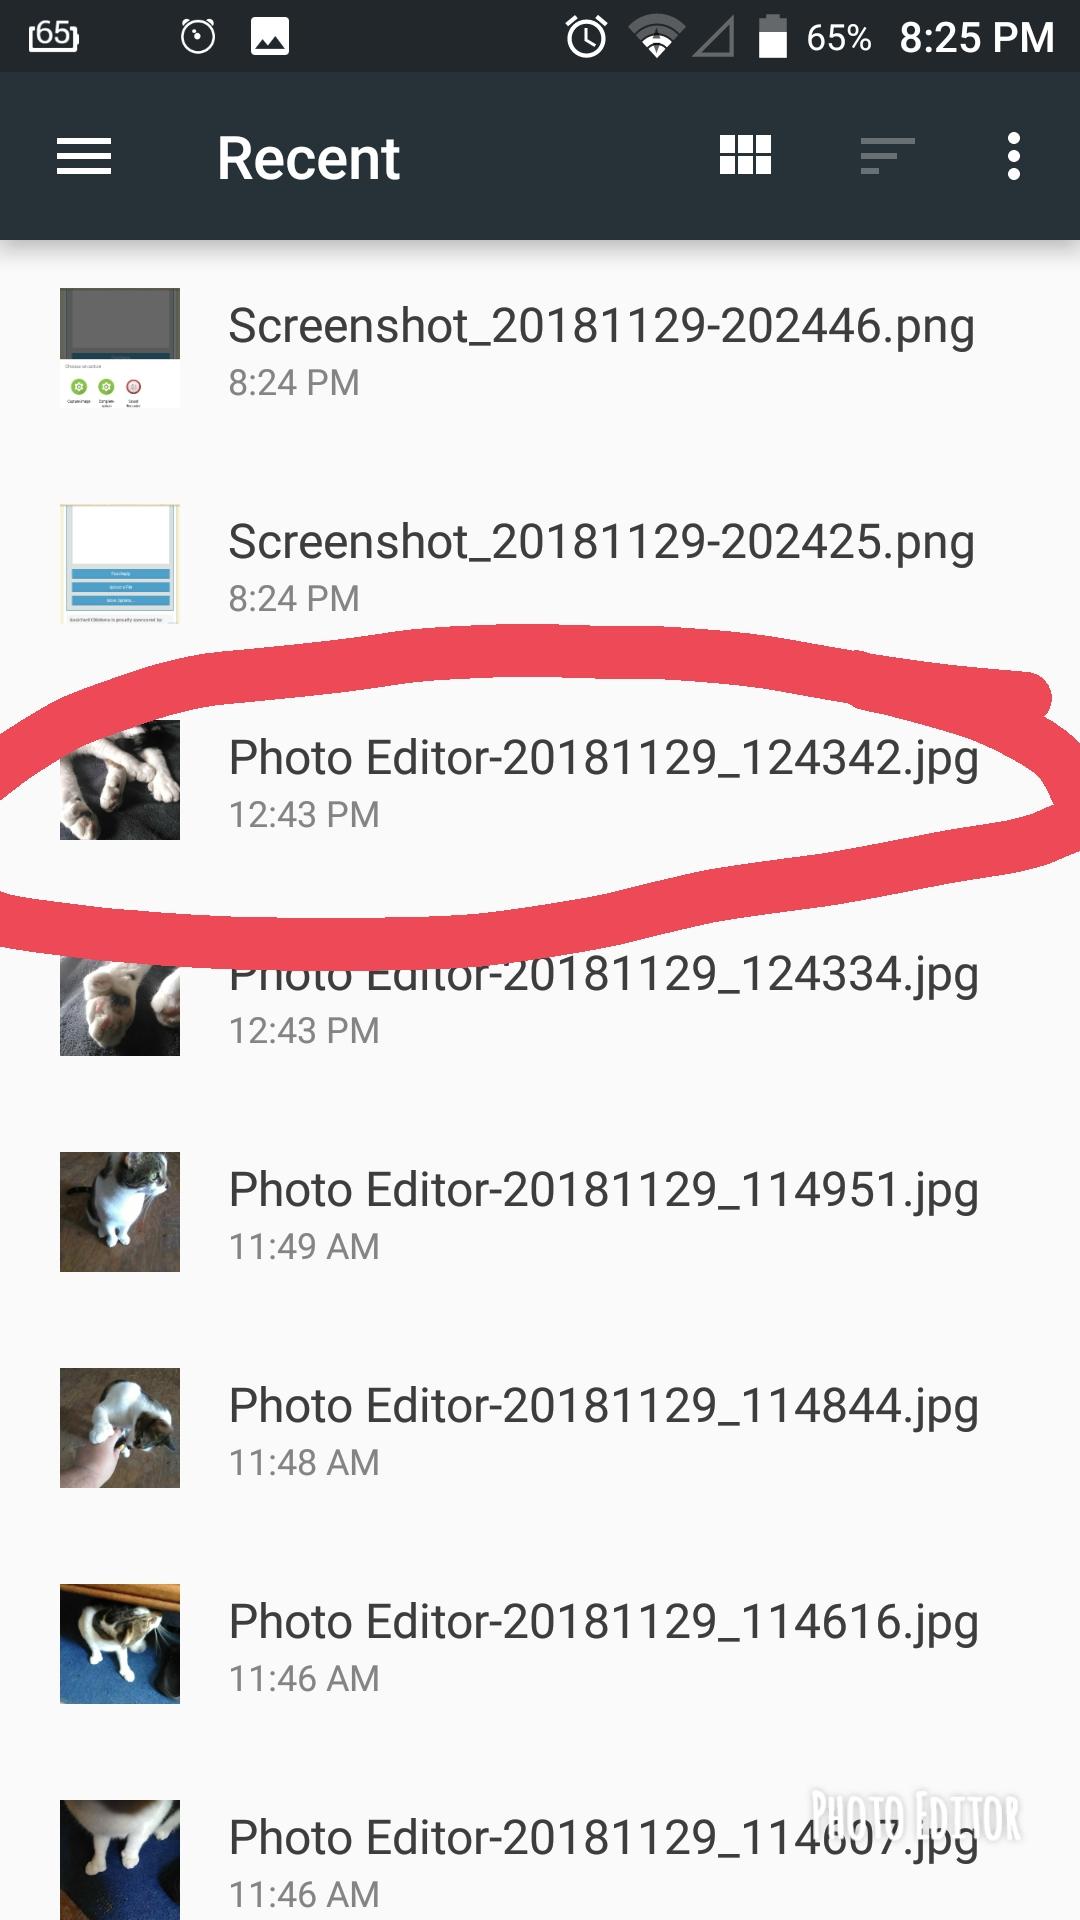 Photo Editor-20181129_202821.jpg